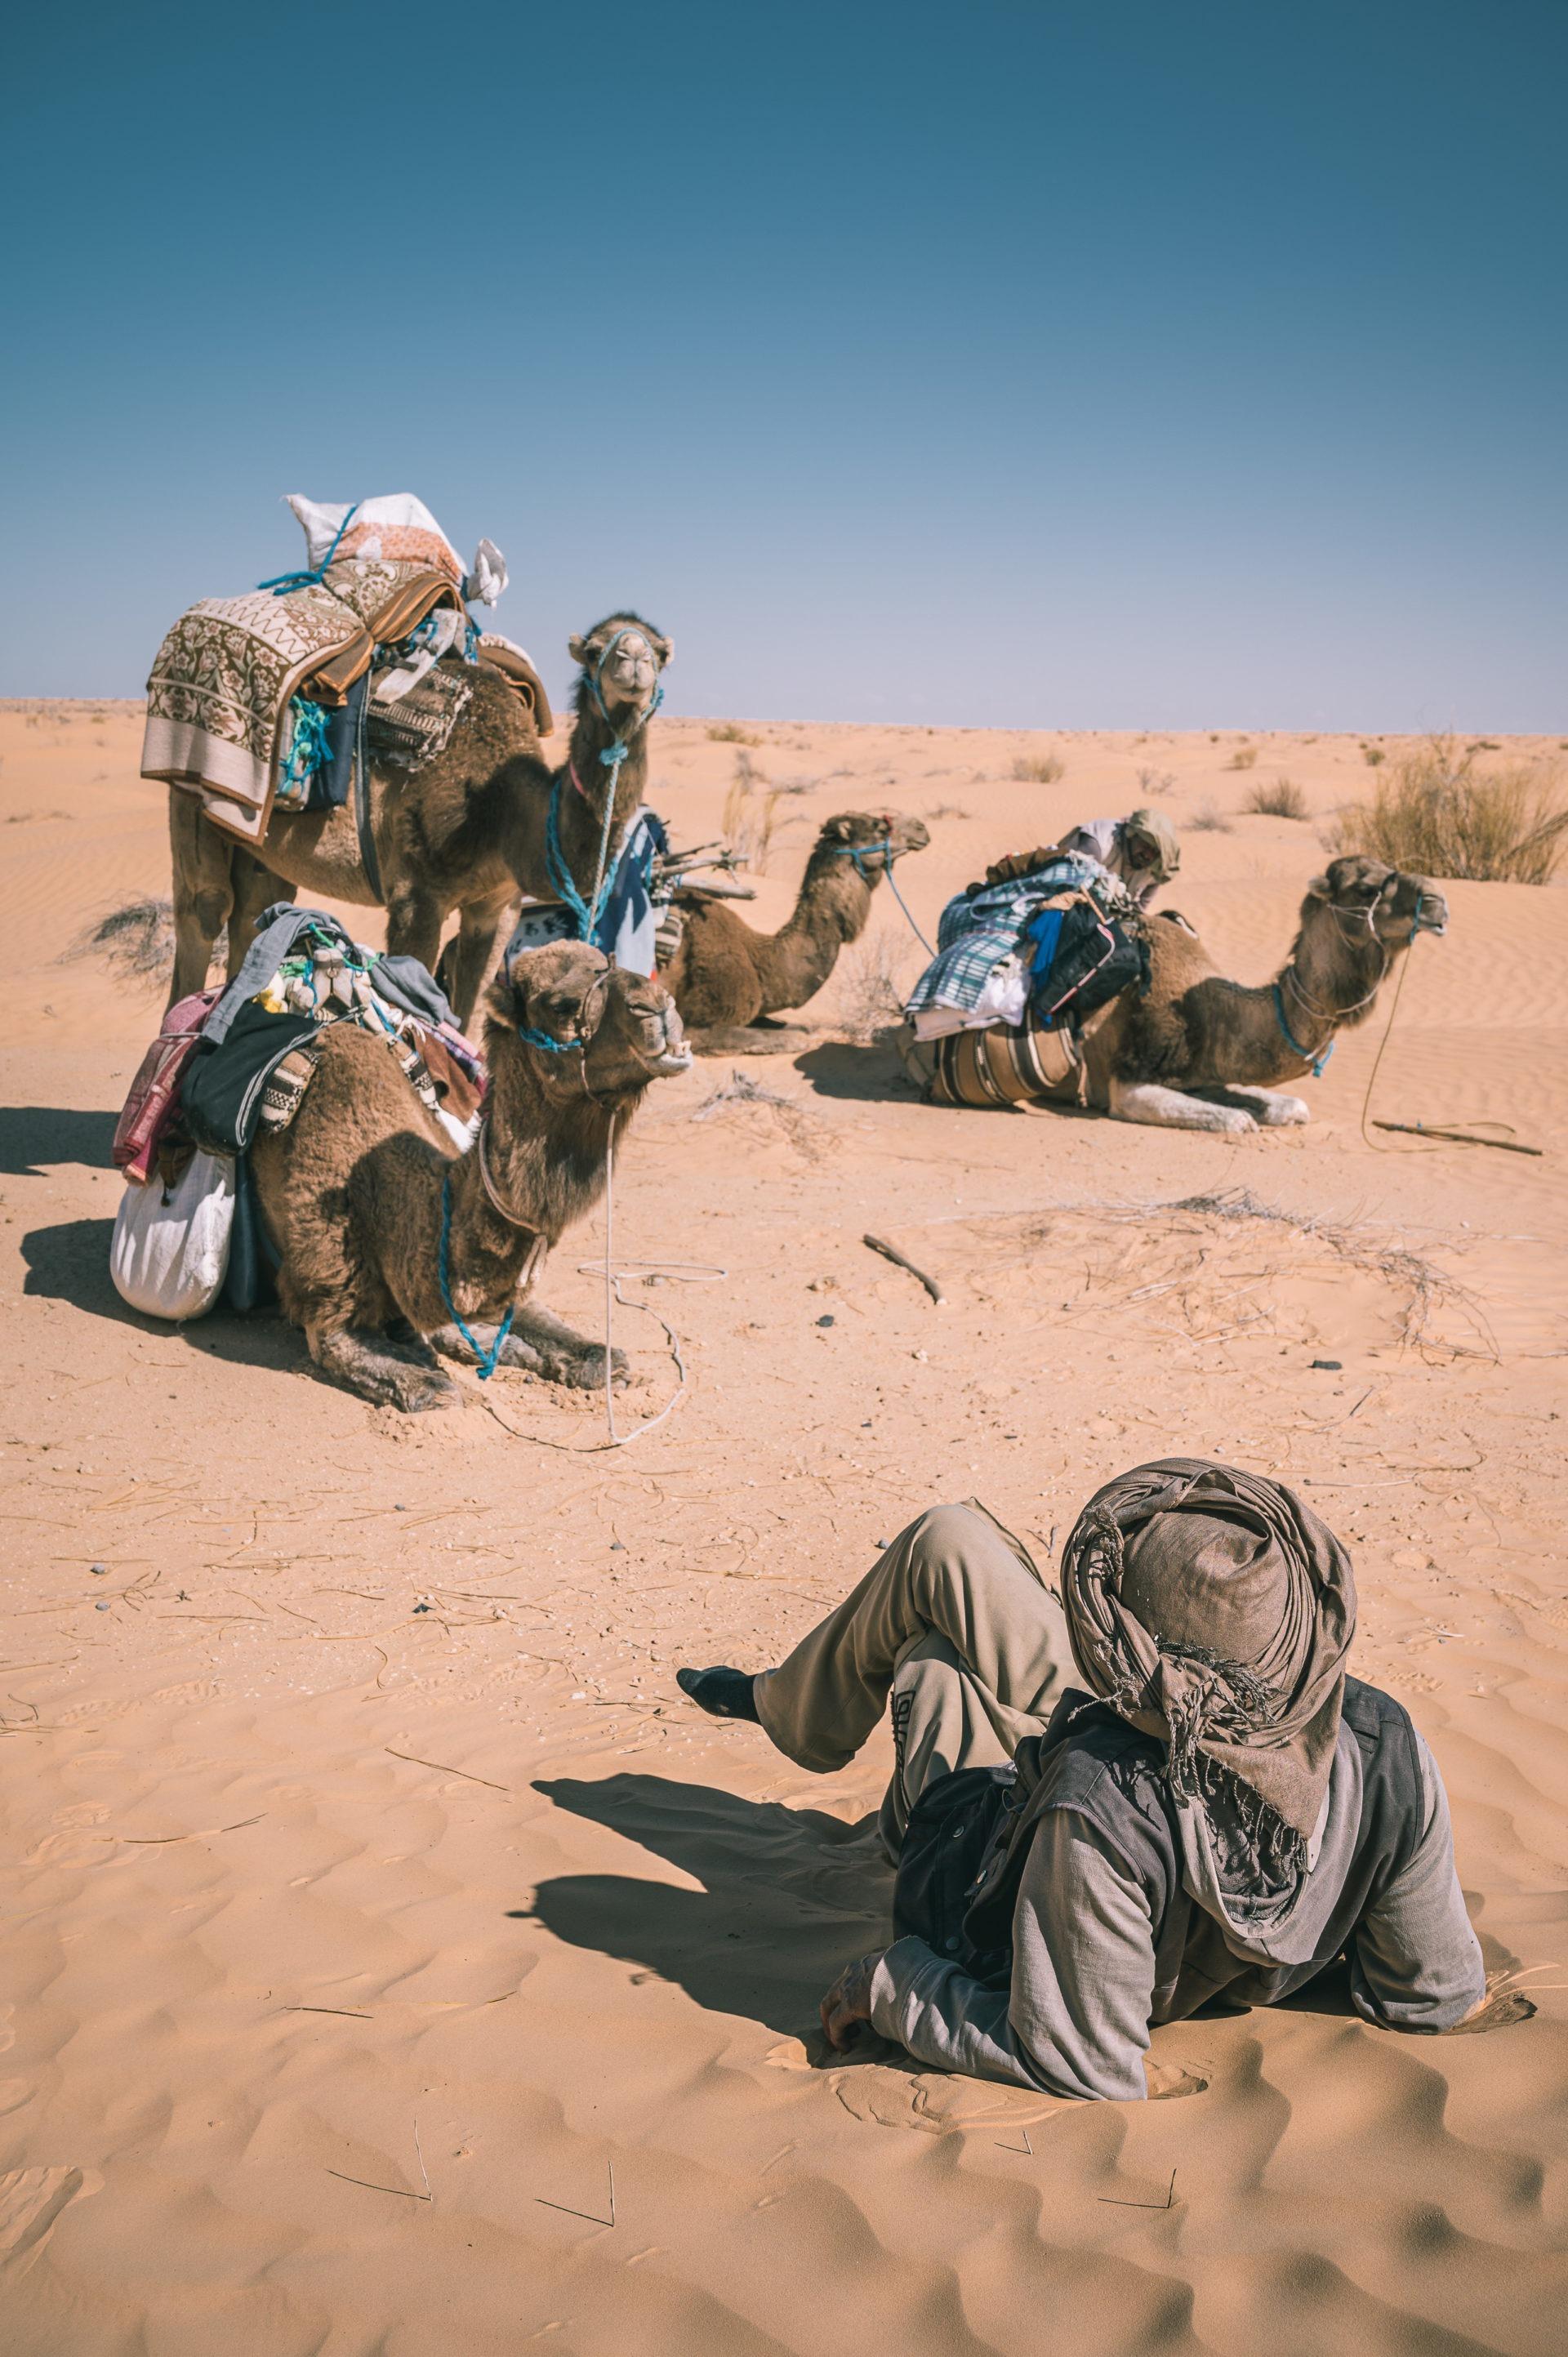 désert Tunisie dromadaire